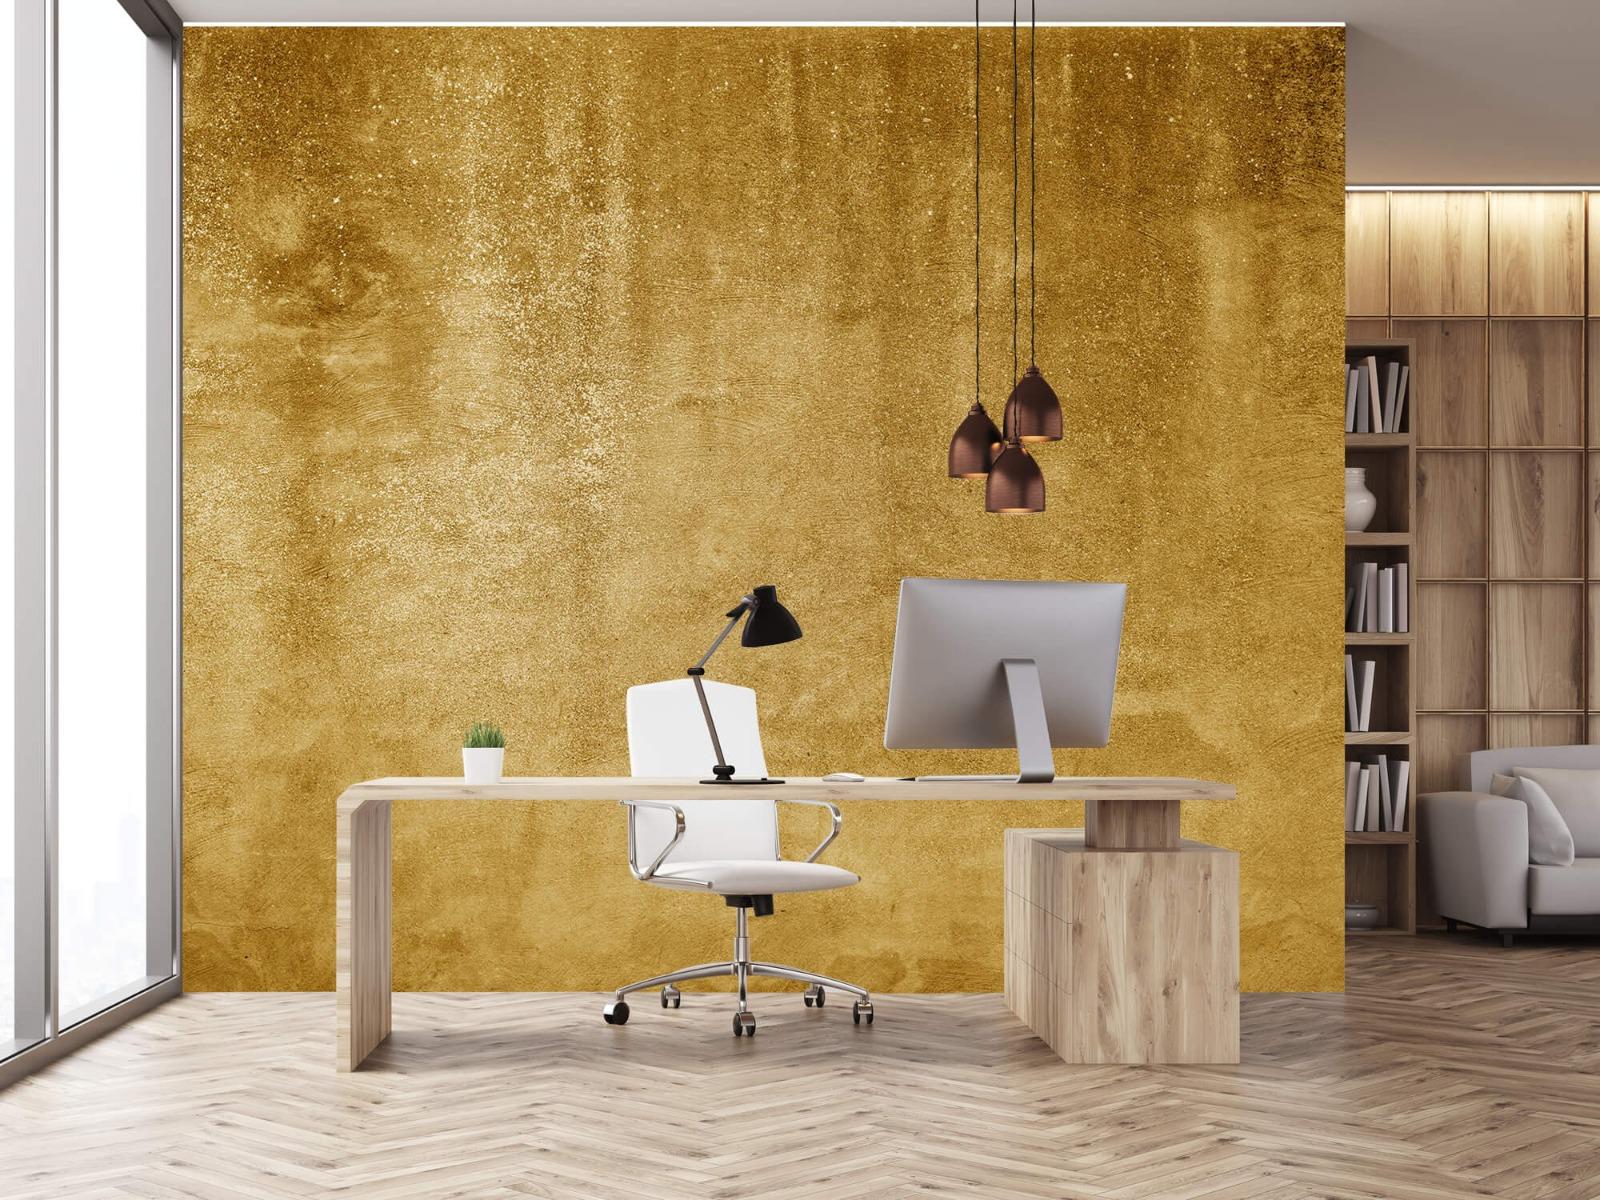 Betonlook behang - Oker geel beton - Woonkamer 24